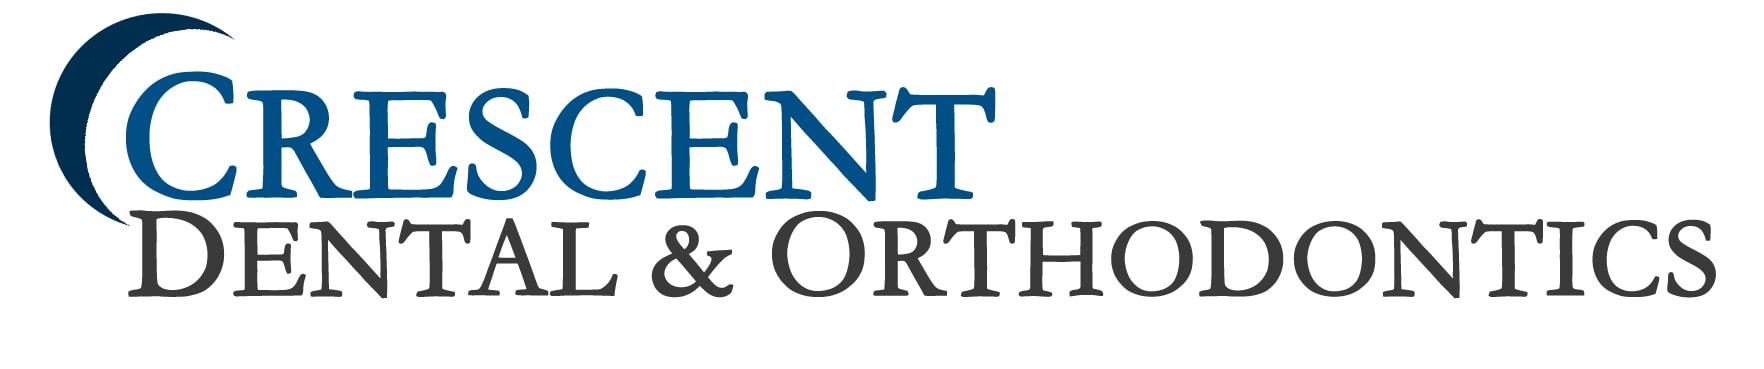 Crescent Dental & Orthodontics